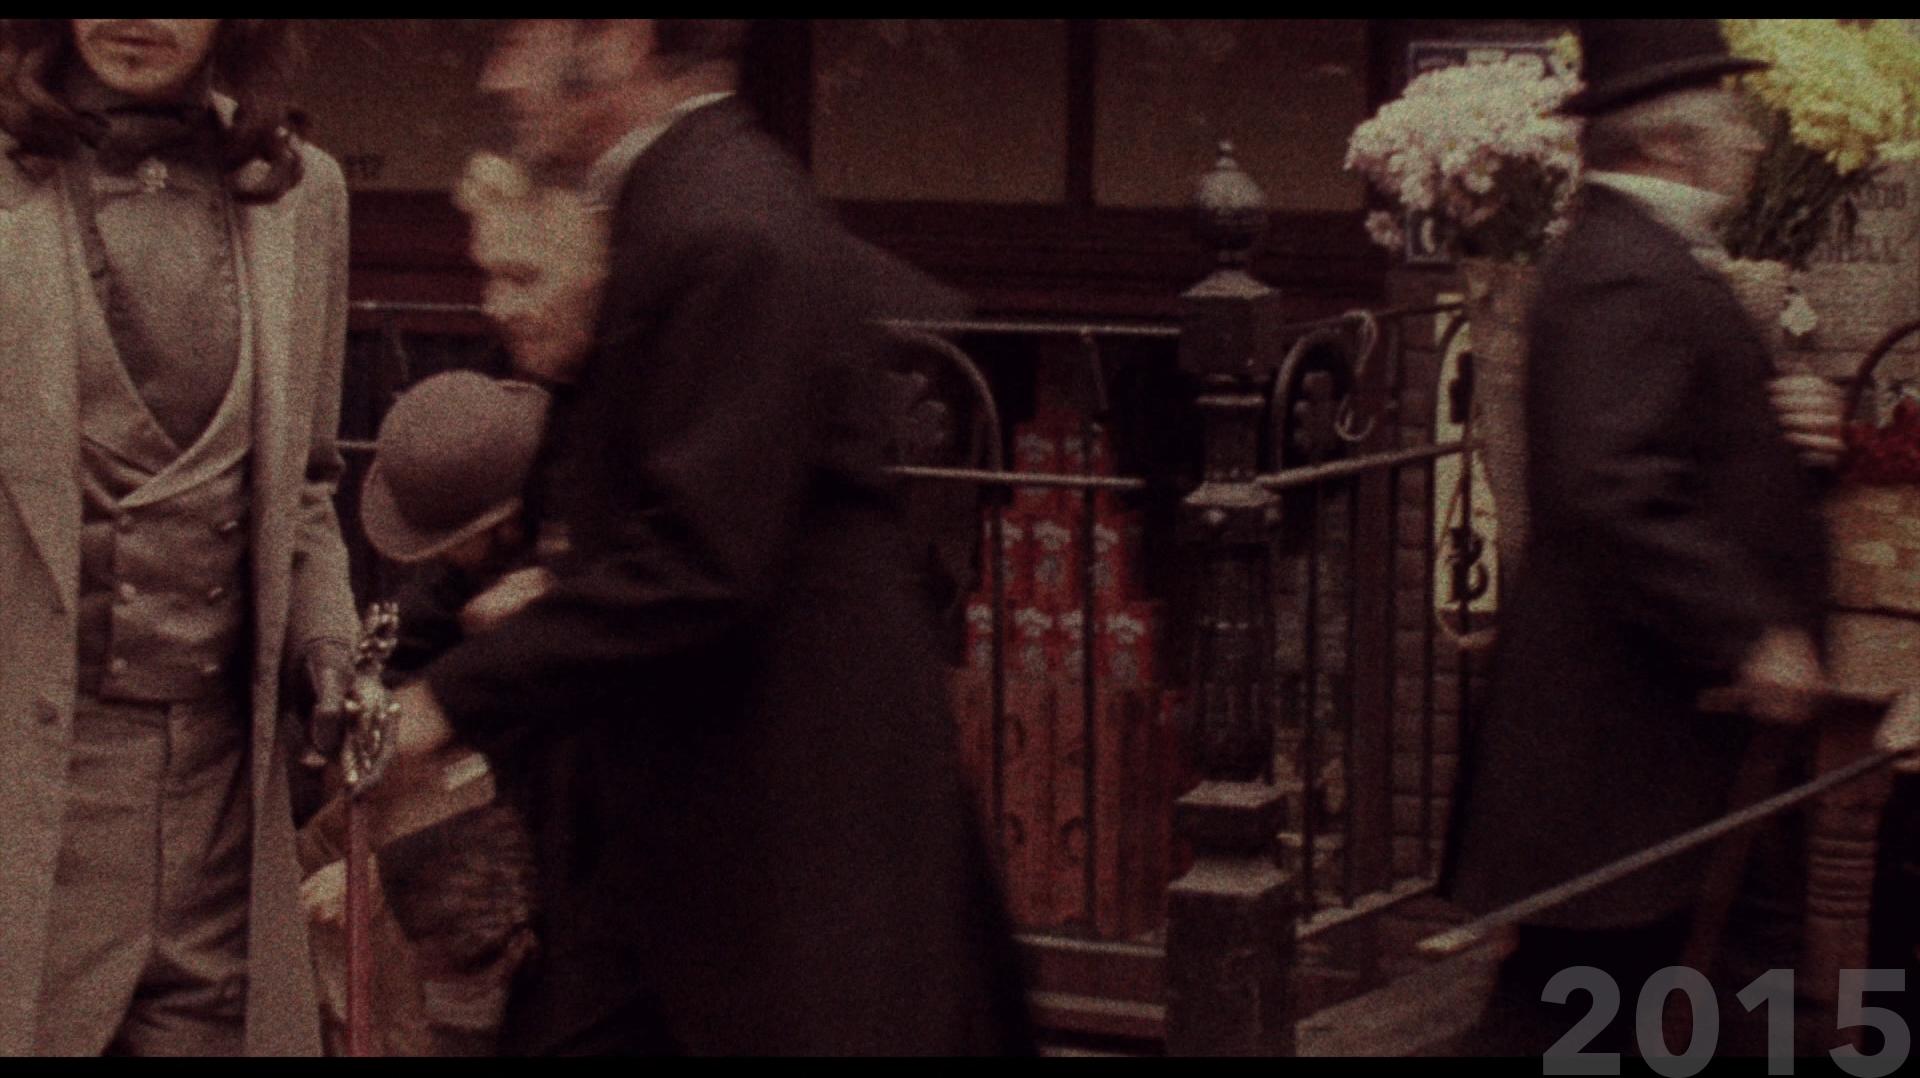 Bram Stoker's Dracula -- Dracula looking for Mina 2015